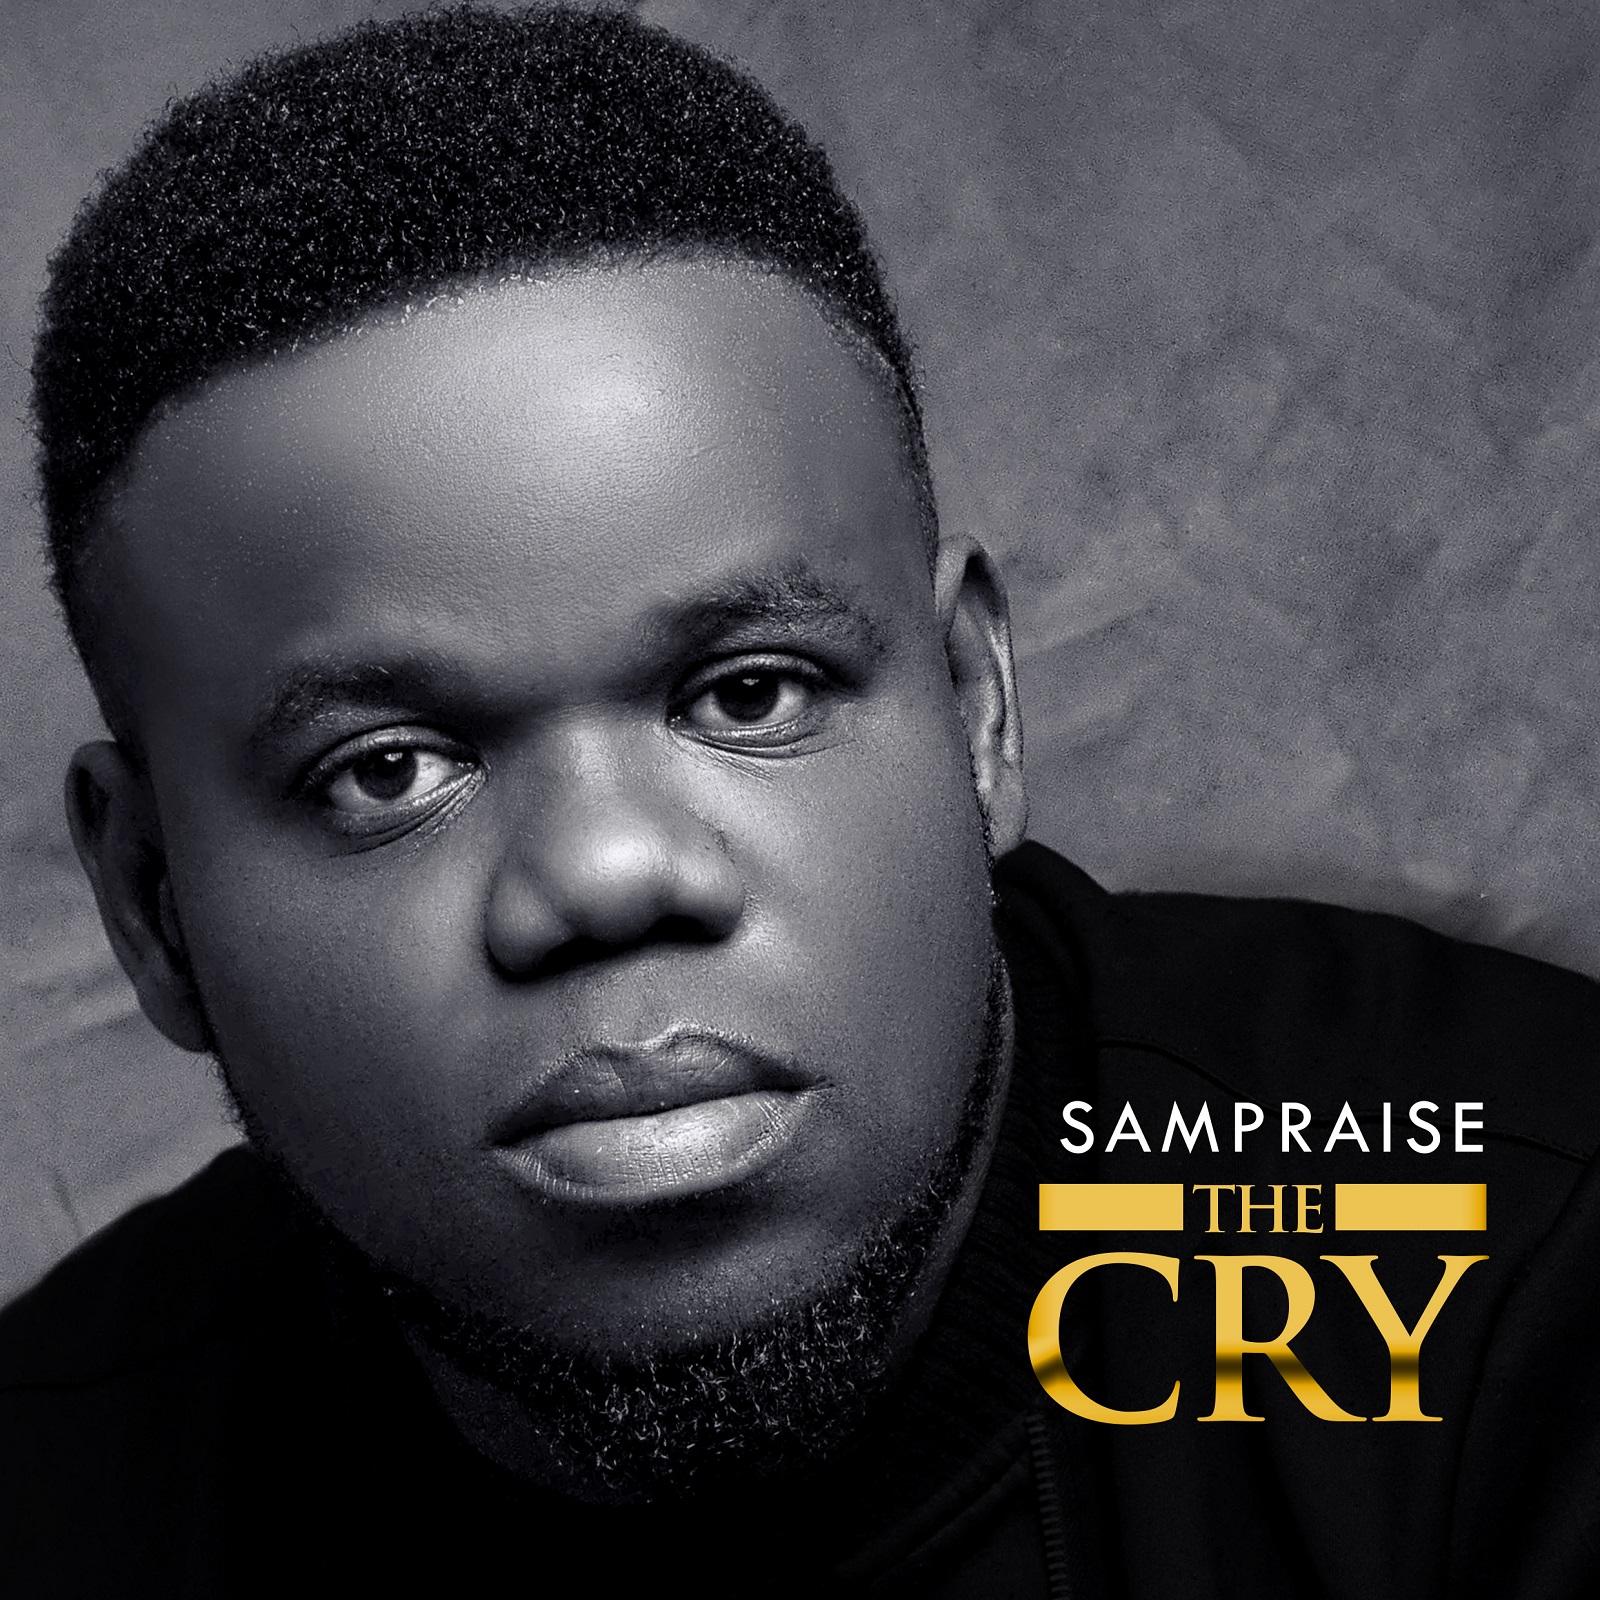 Sampraise The Cry